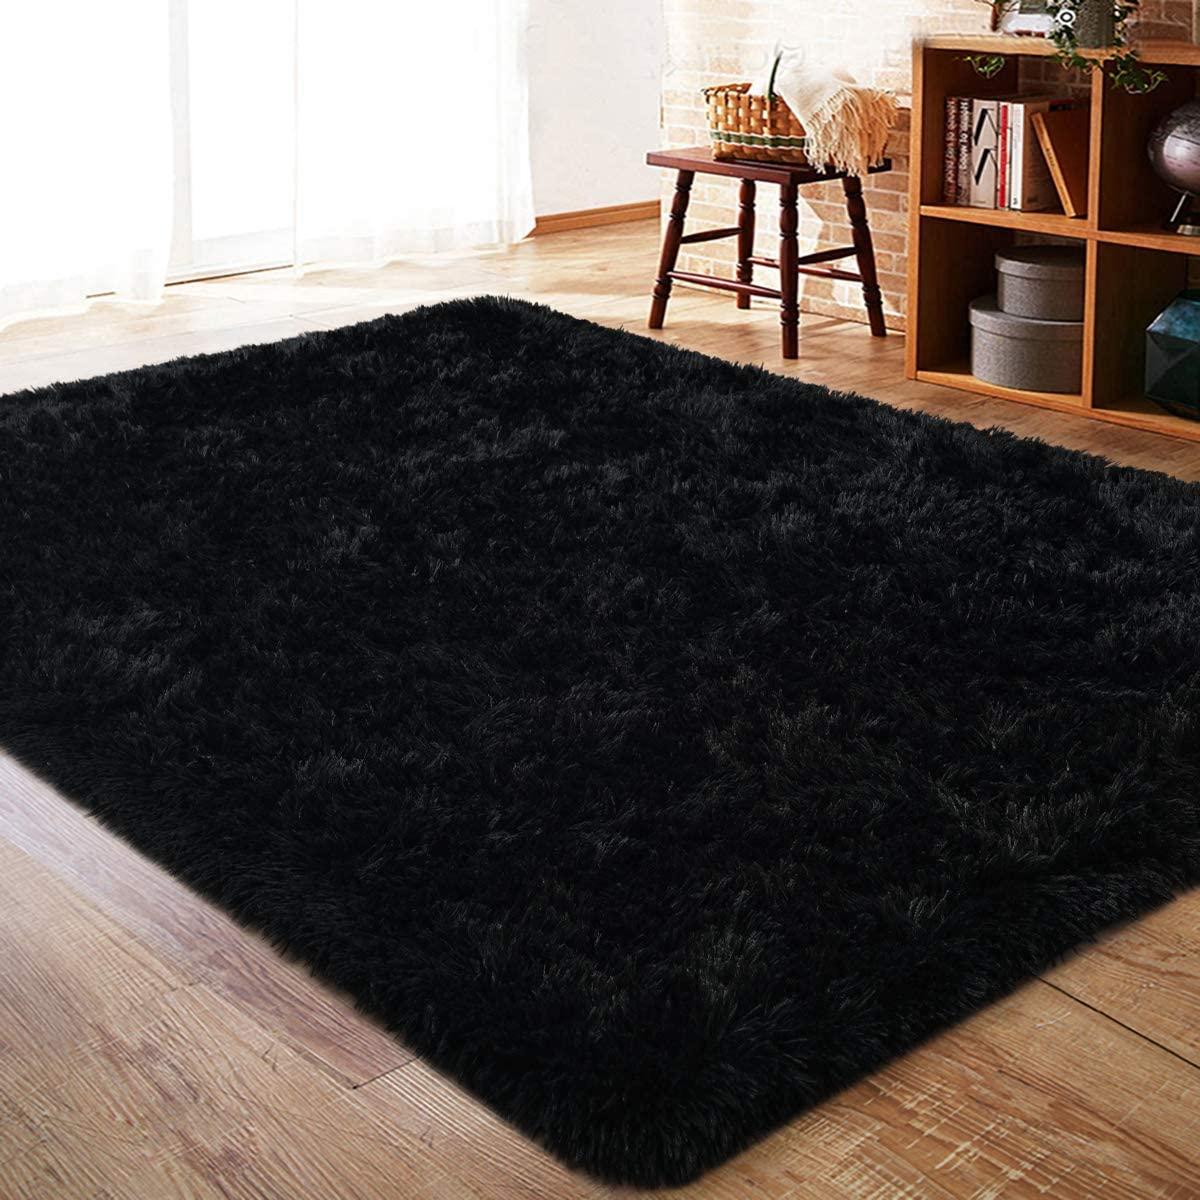 Super Soft Bedroom Area Rugs Shaggy Plush Carpet Rectangle Fluffy Bedside Rug Colorful Multi Plush Fuzzy Decorative Floor Carpet